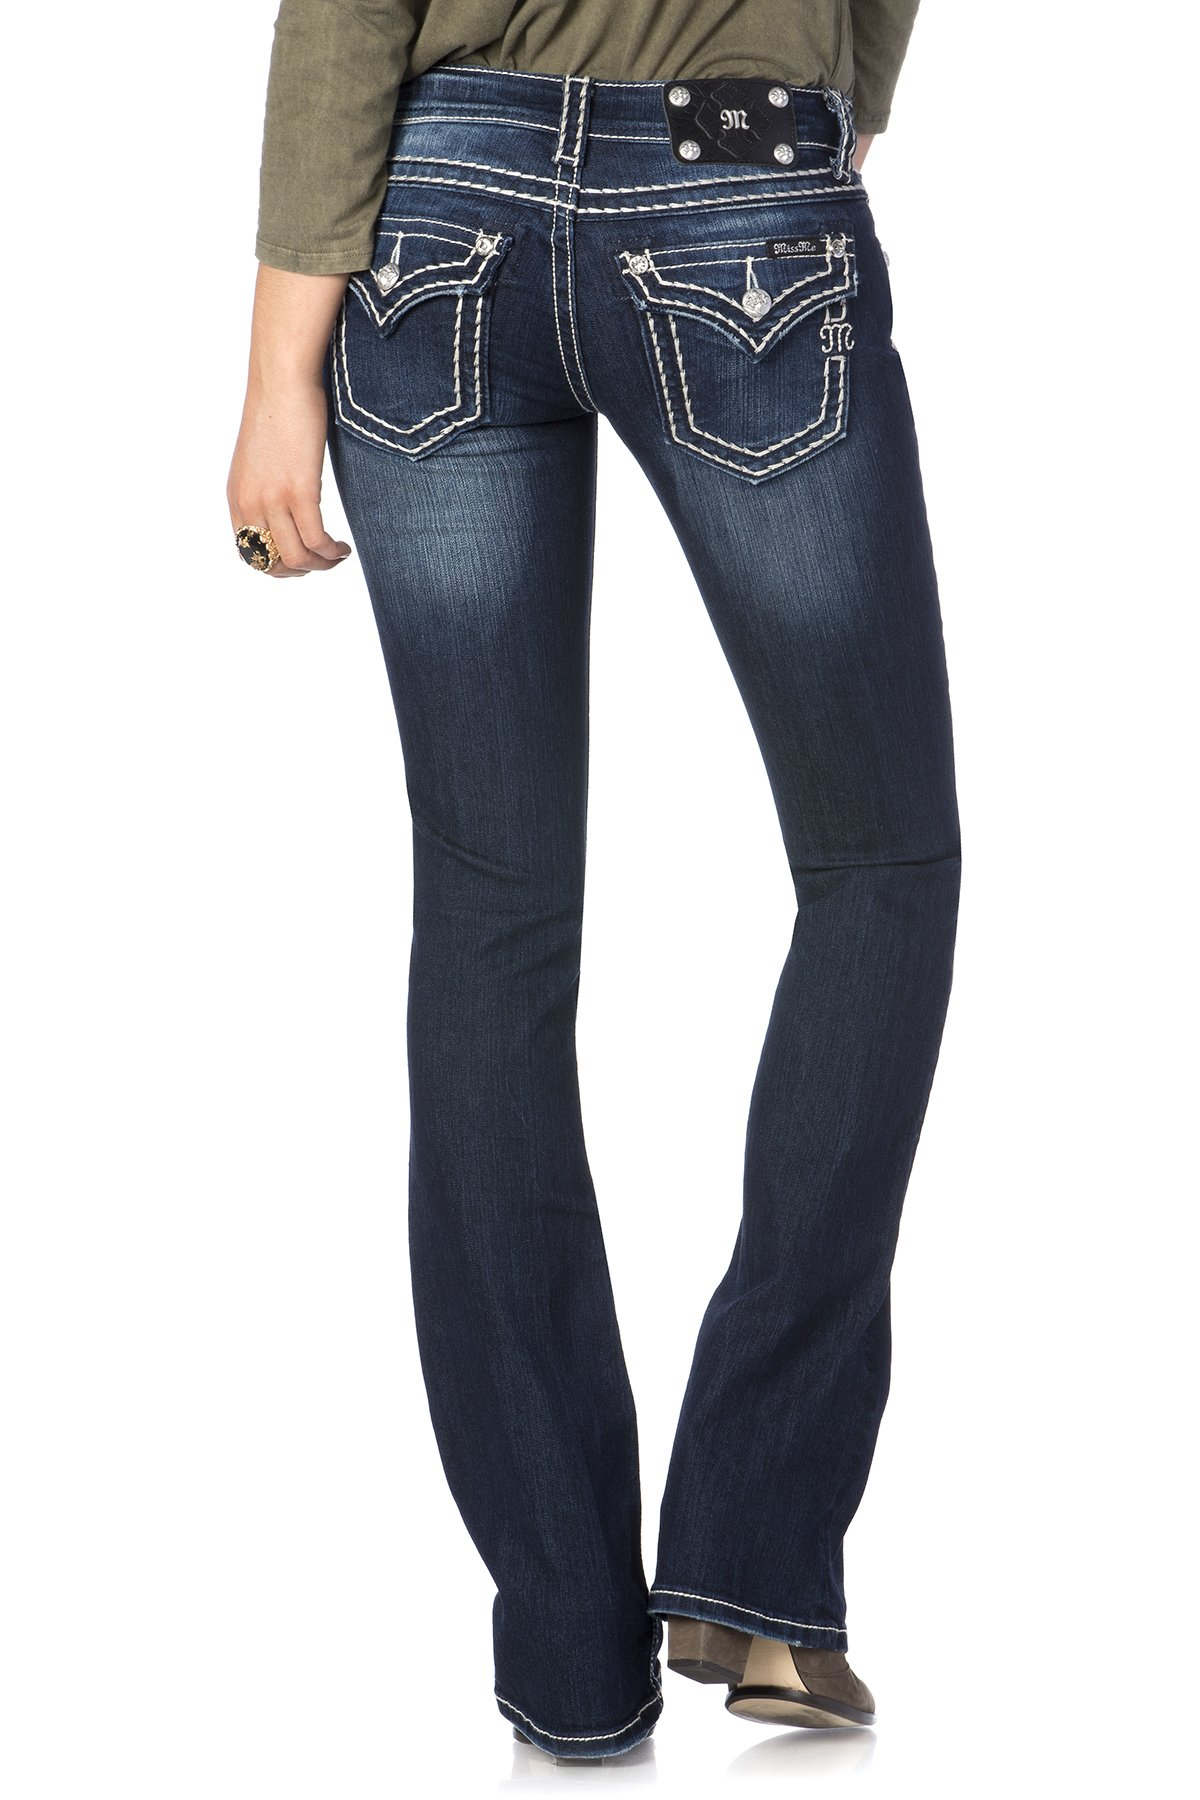 Miss Me Loose Saddle Stitch Border Boot Cut Jean 29